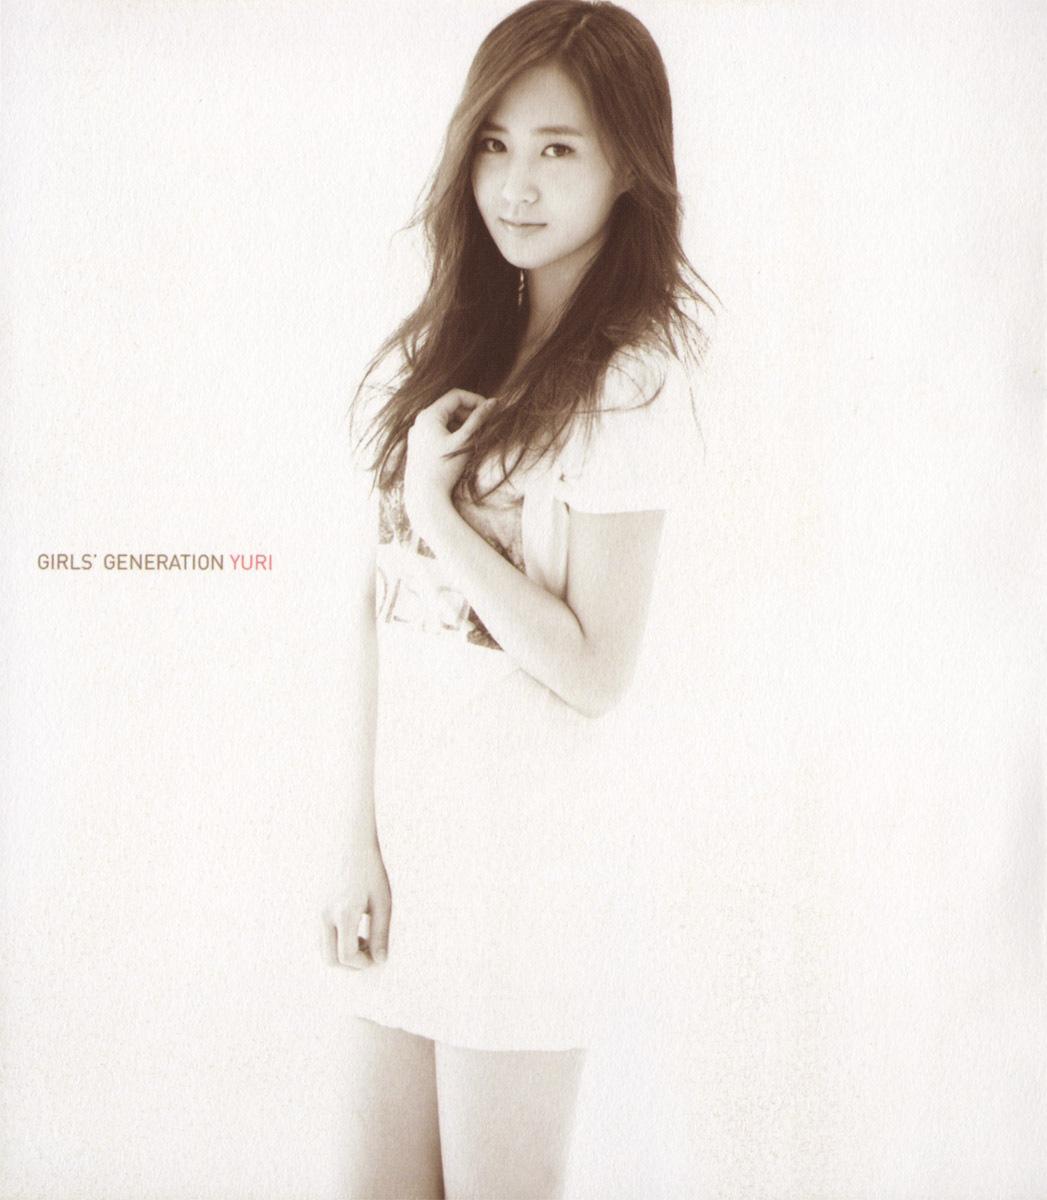 YUri-girls-generation-snsd-7128776-1047-